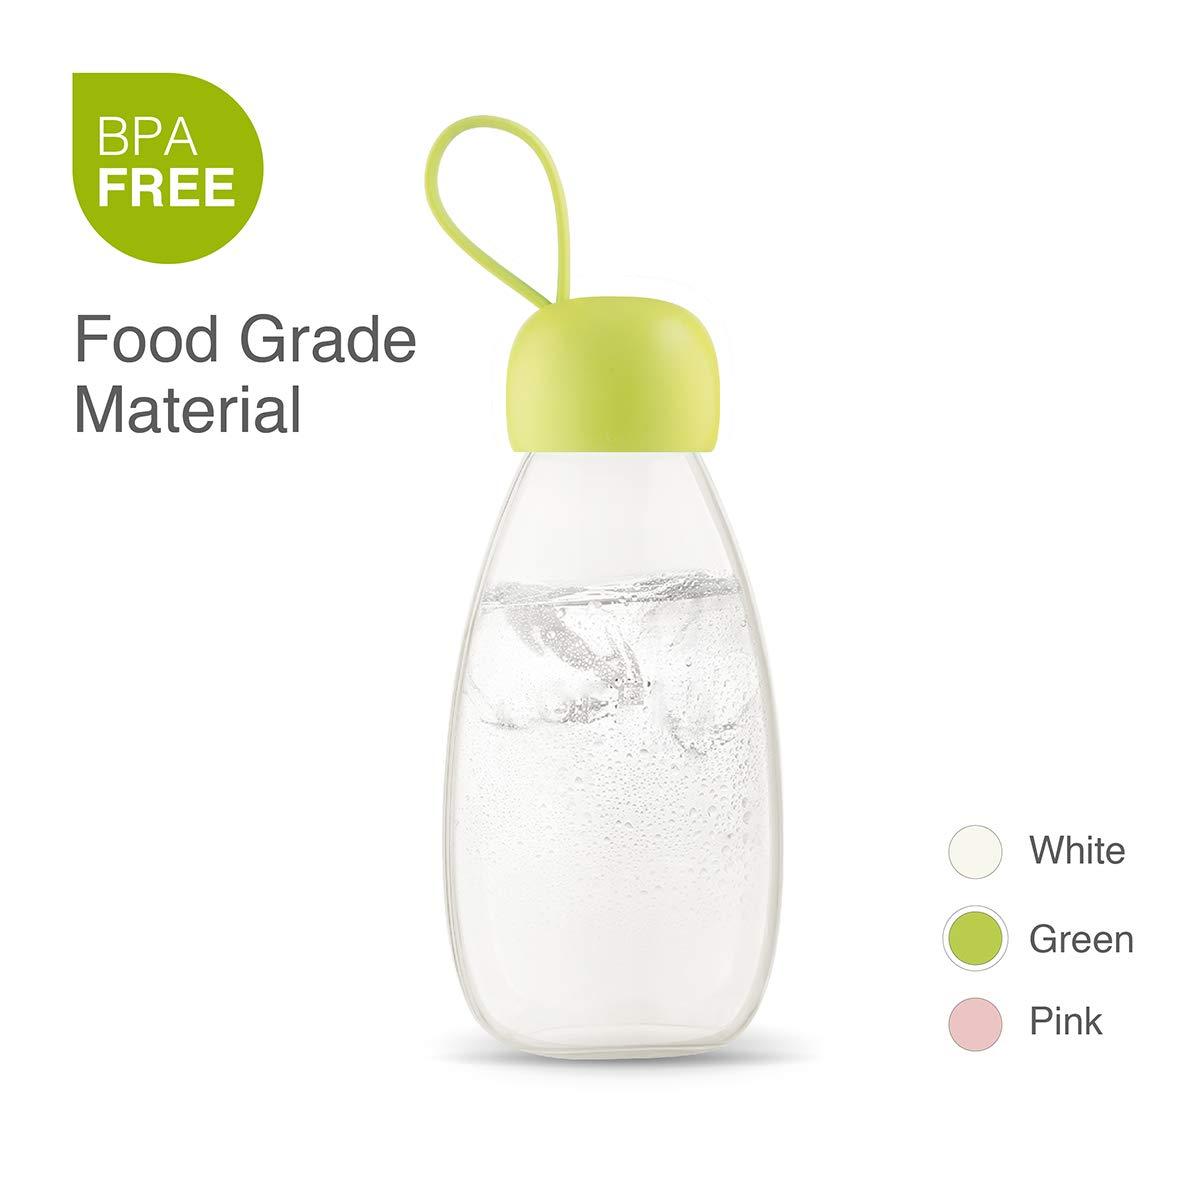 07e126733fda emoi Water Bottle, 12/16 oz Small Kids Water Bottle with Strap for Girls  Boys Kid Toddler Women Men Sports,100% BPA Free, Leak Proof Drinking Bottle